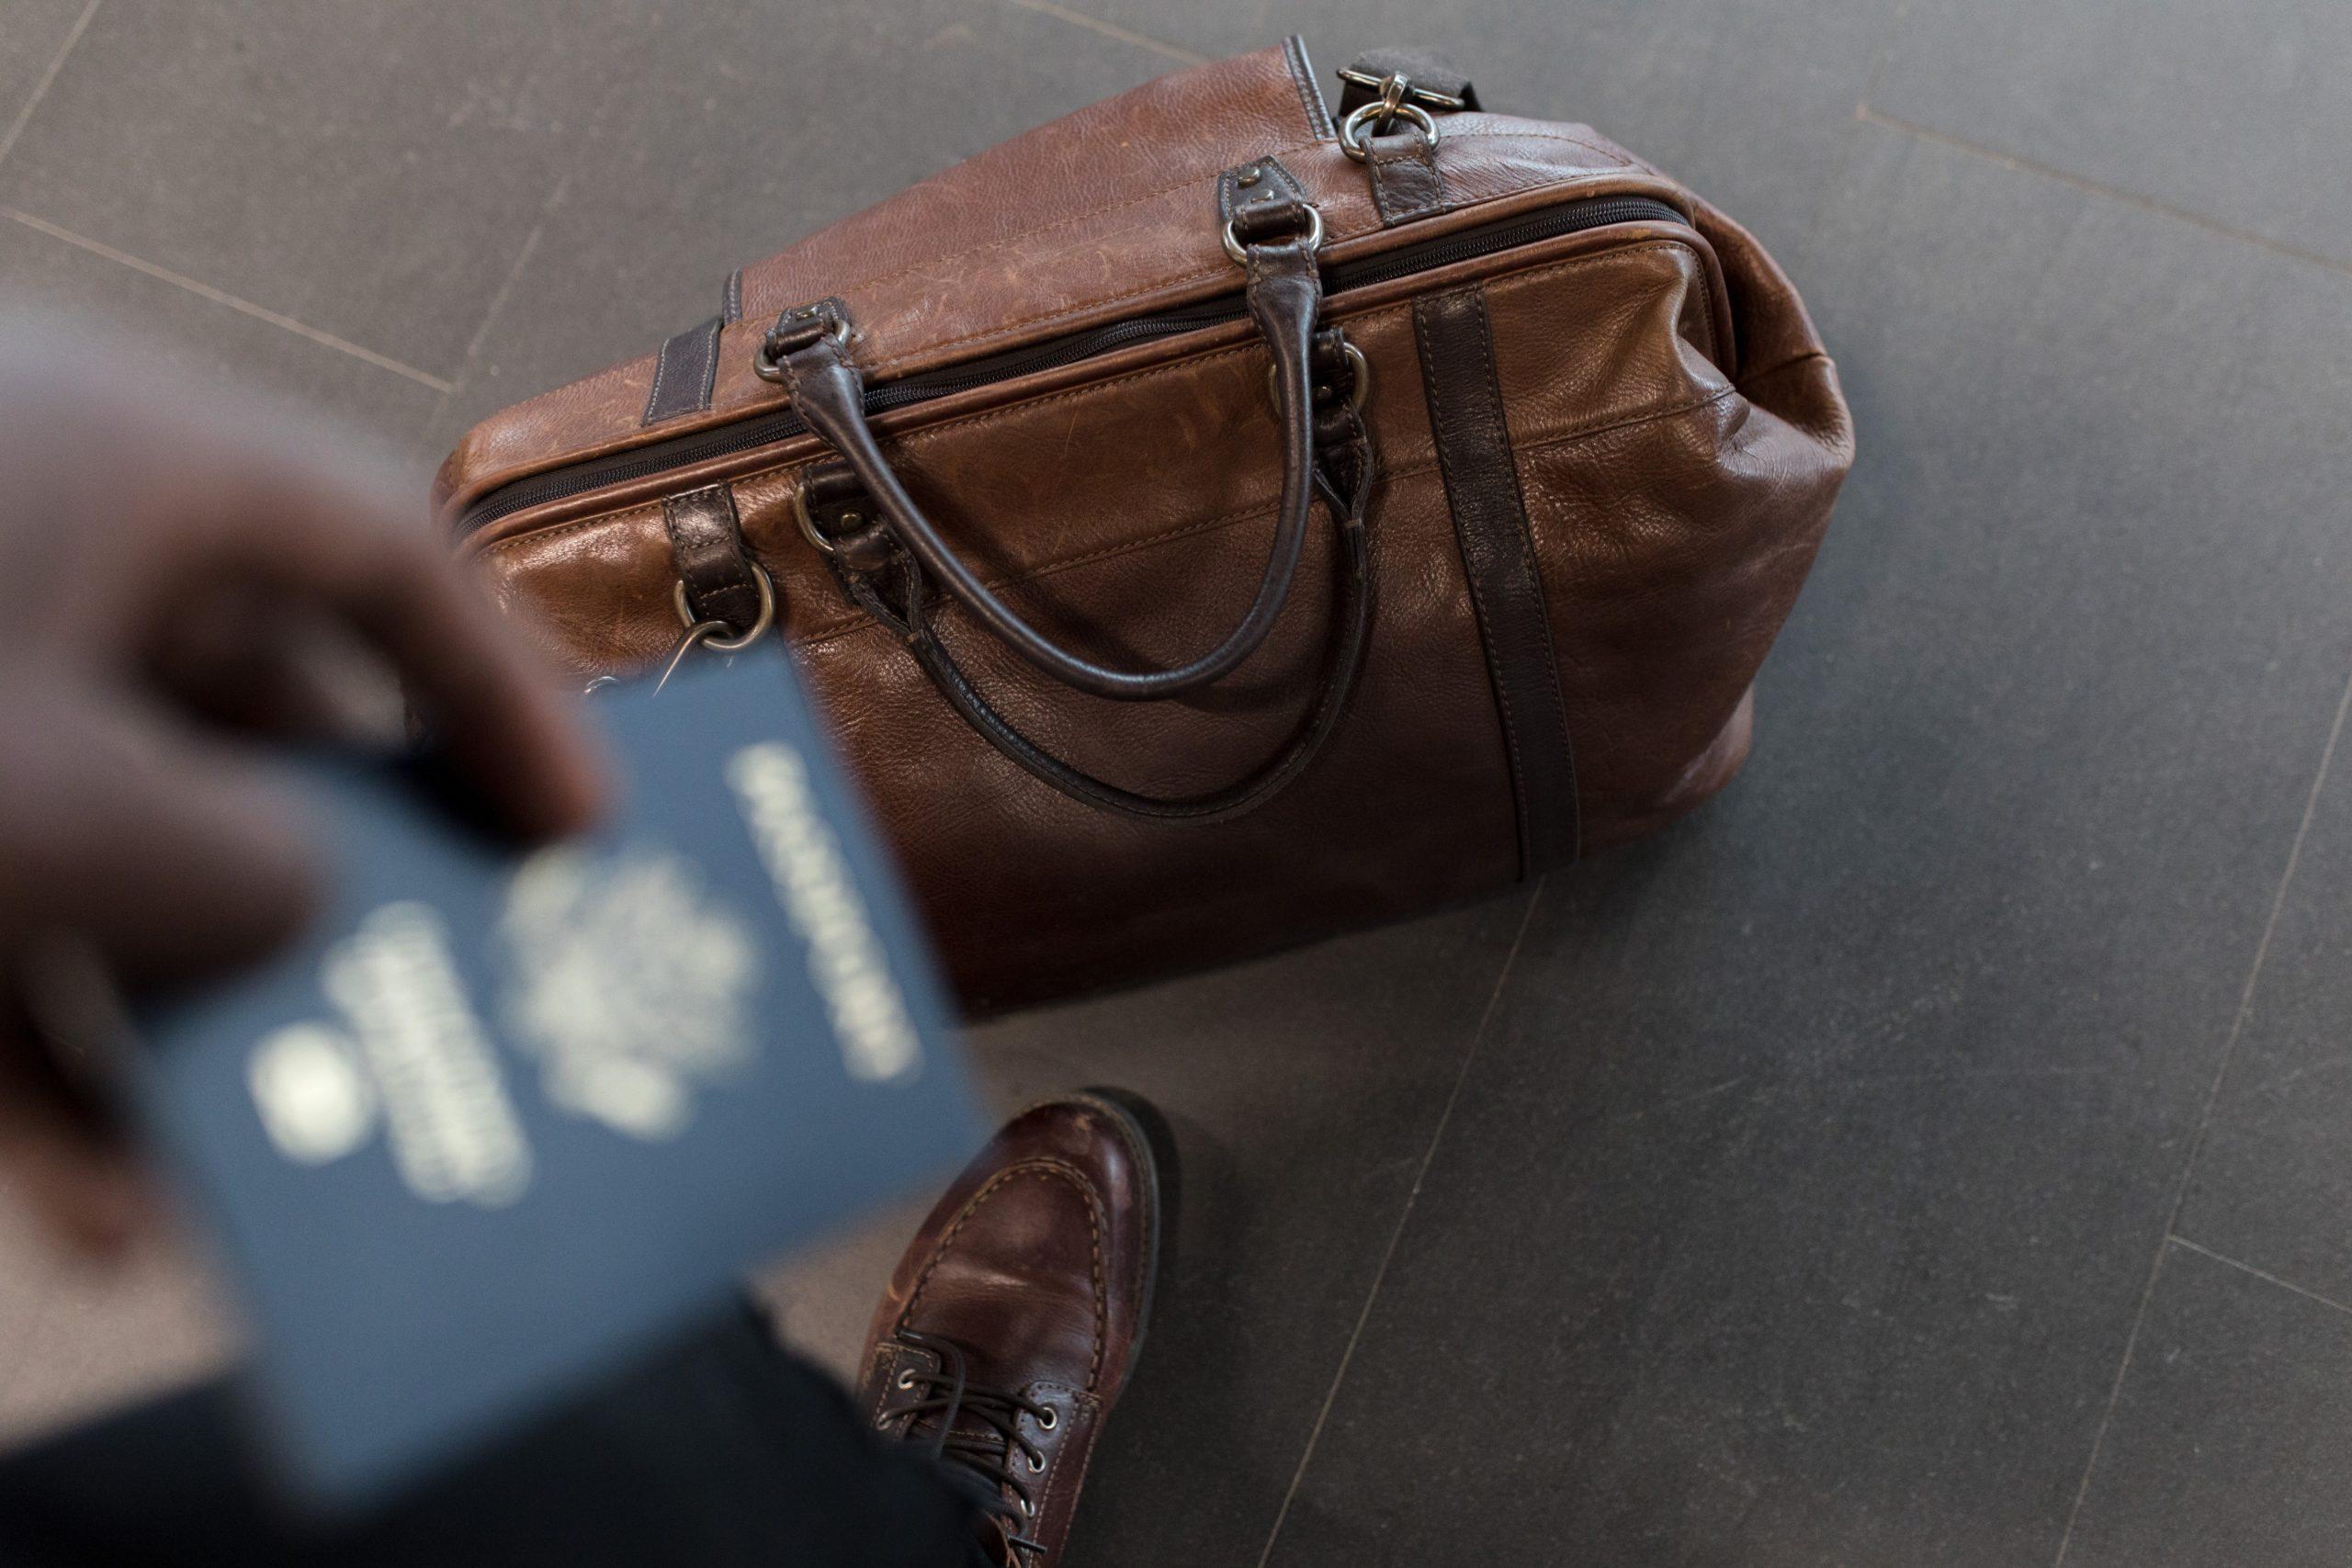 Reisverzekering kiezen